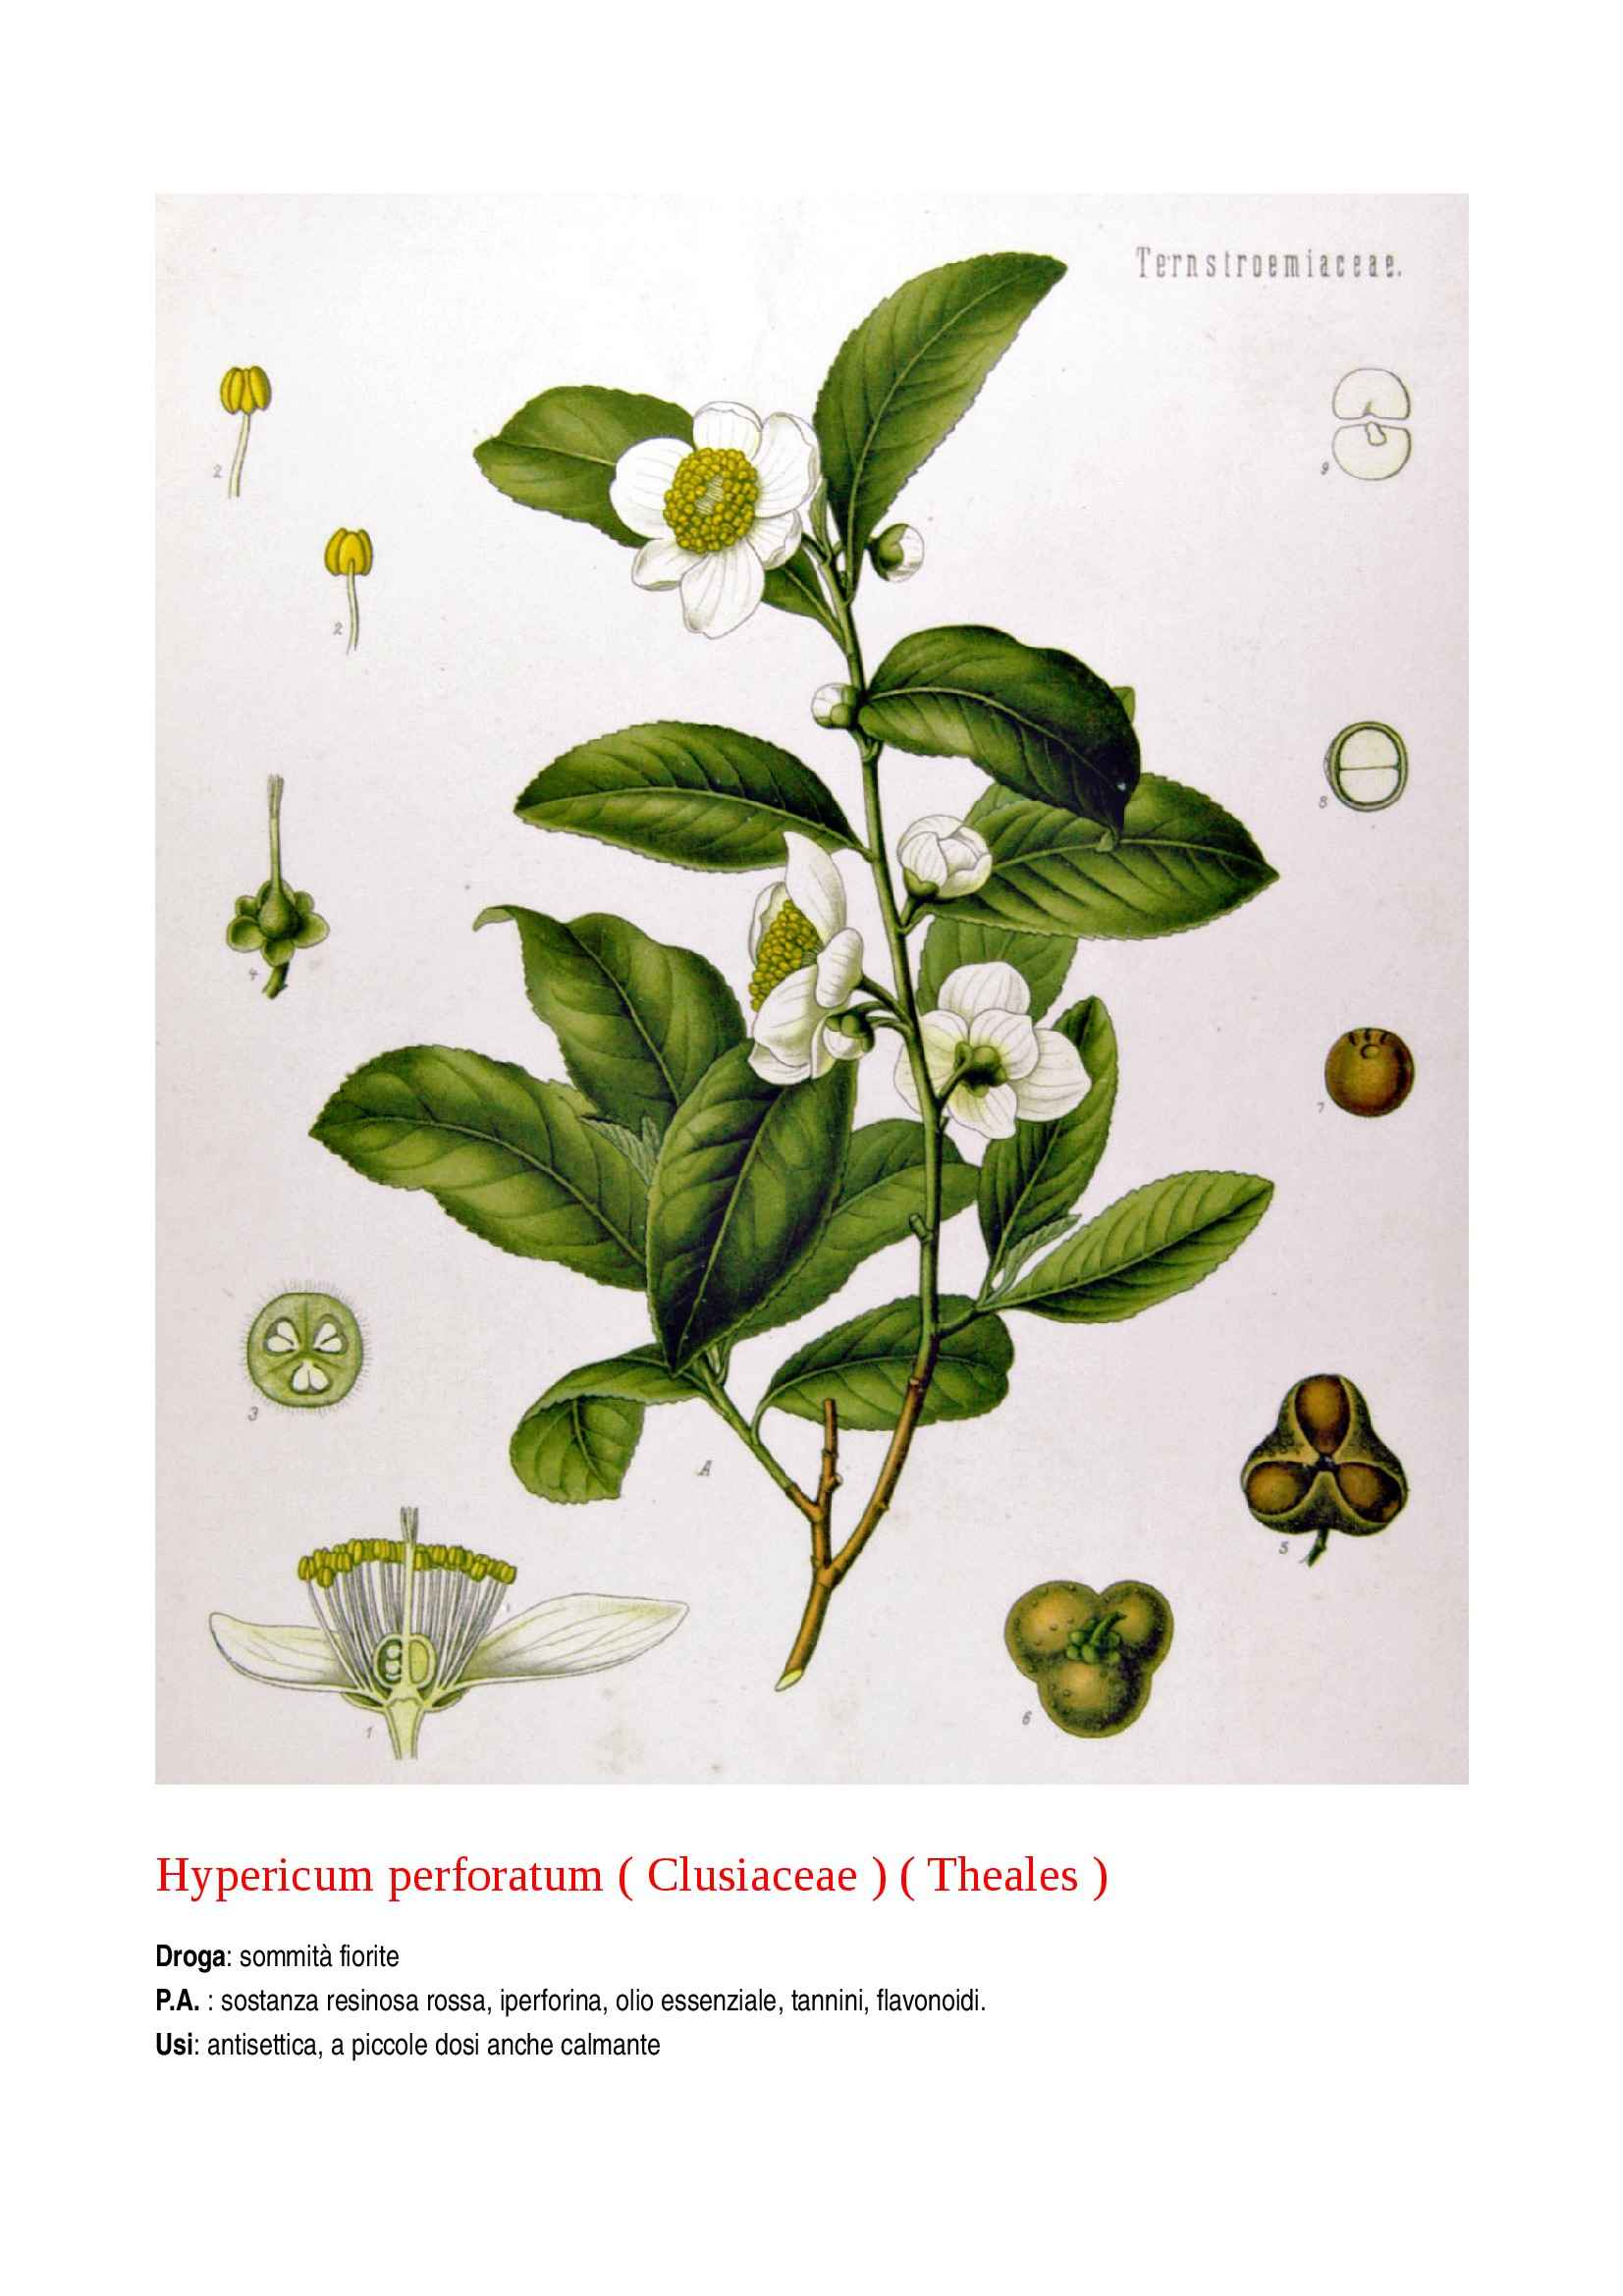 Botanica farmaceutica Pag. 16